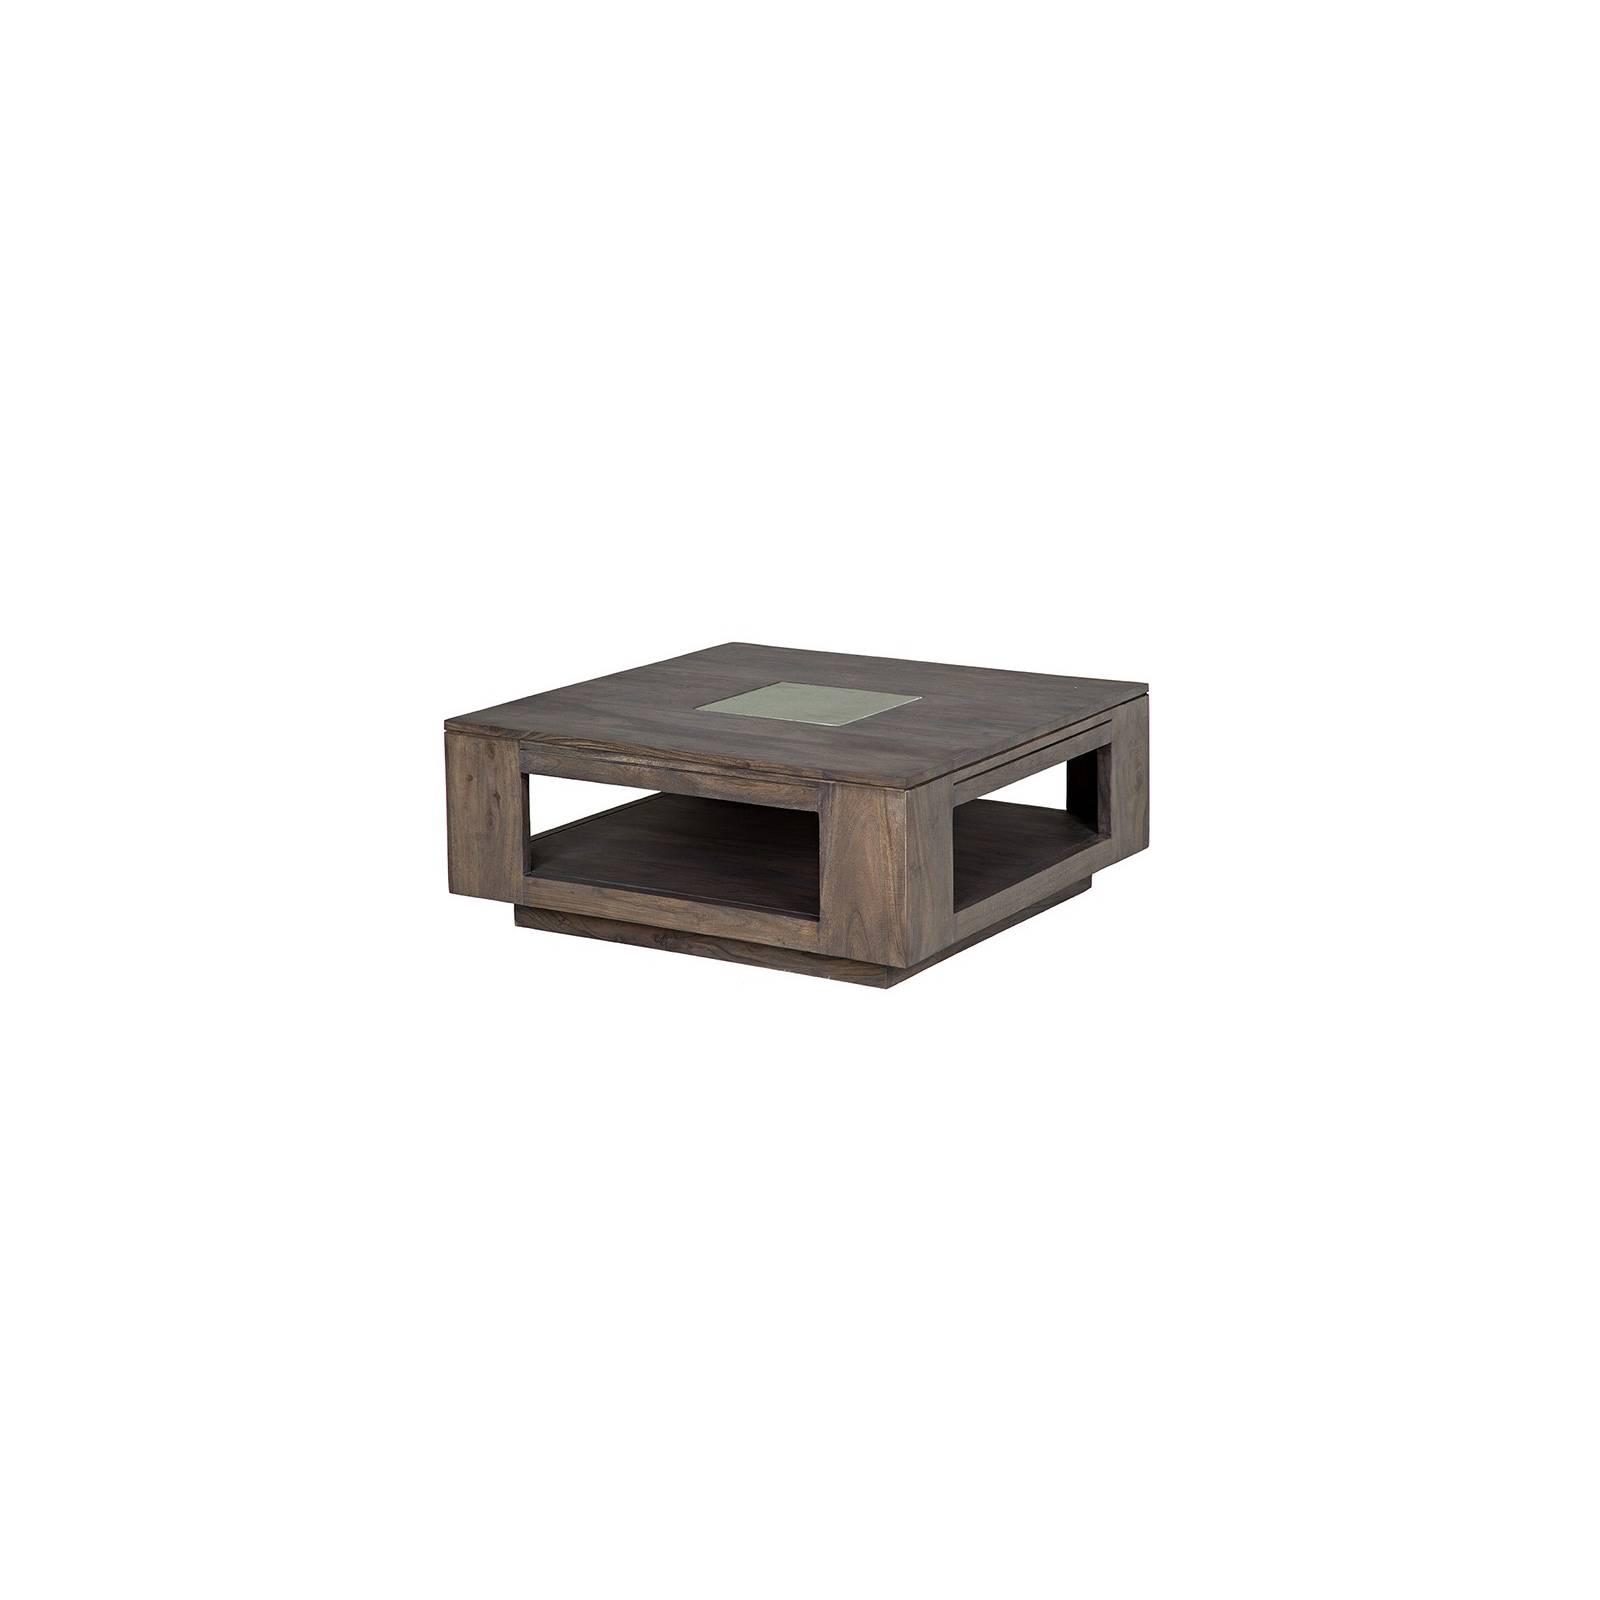 Table Basse Pierre Tara Grisee Acacia